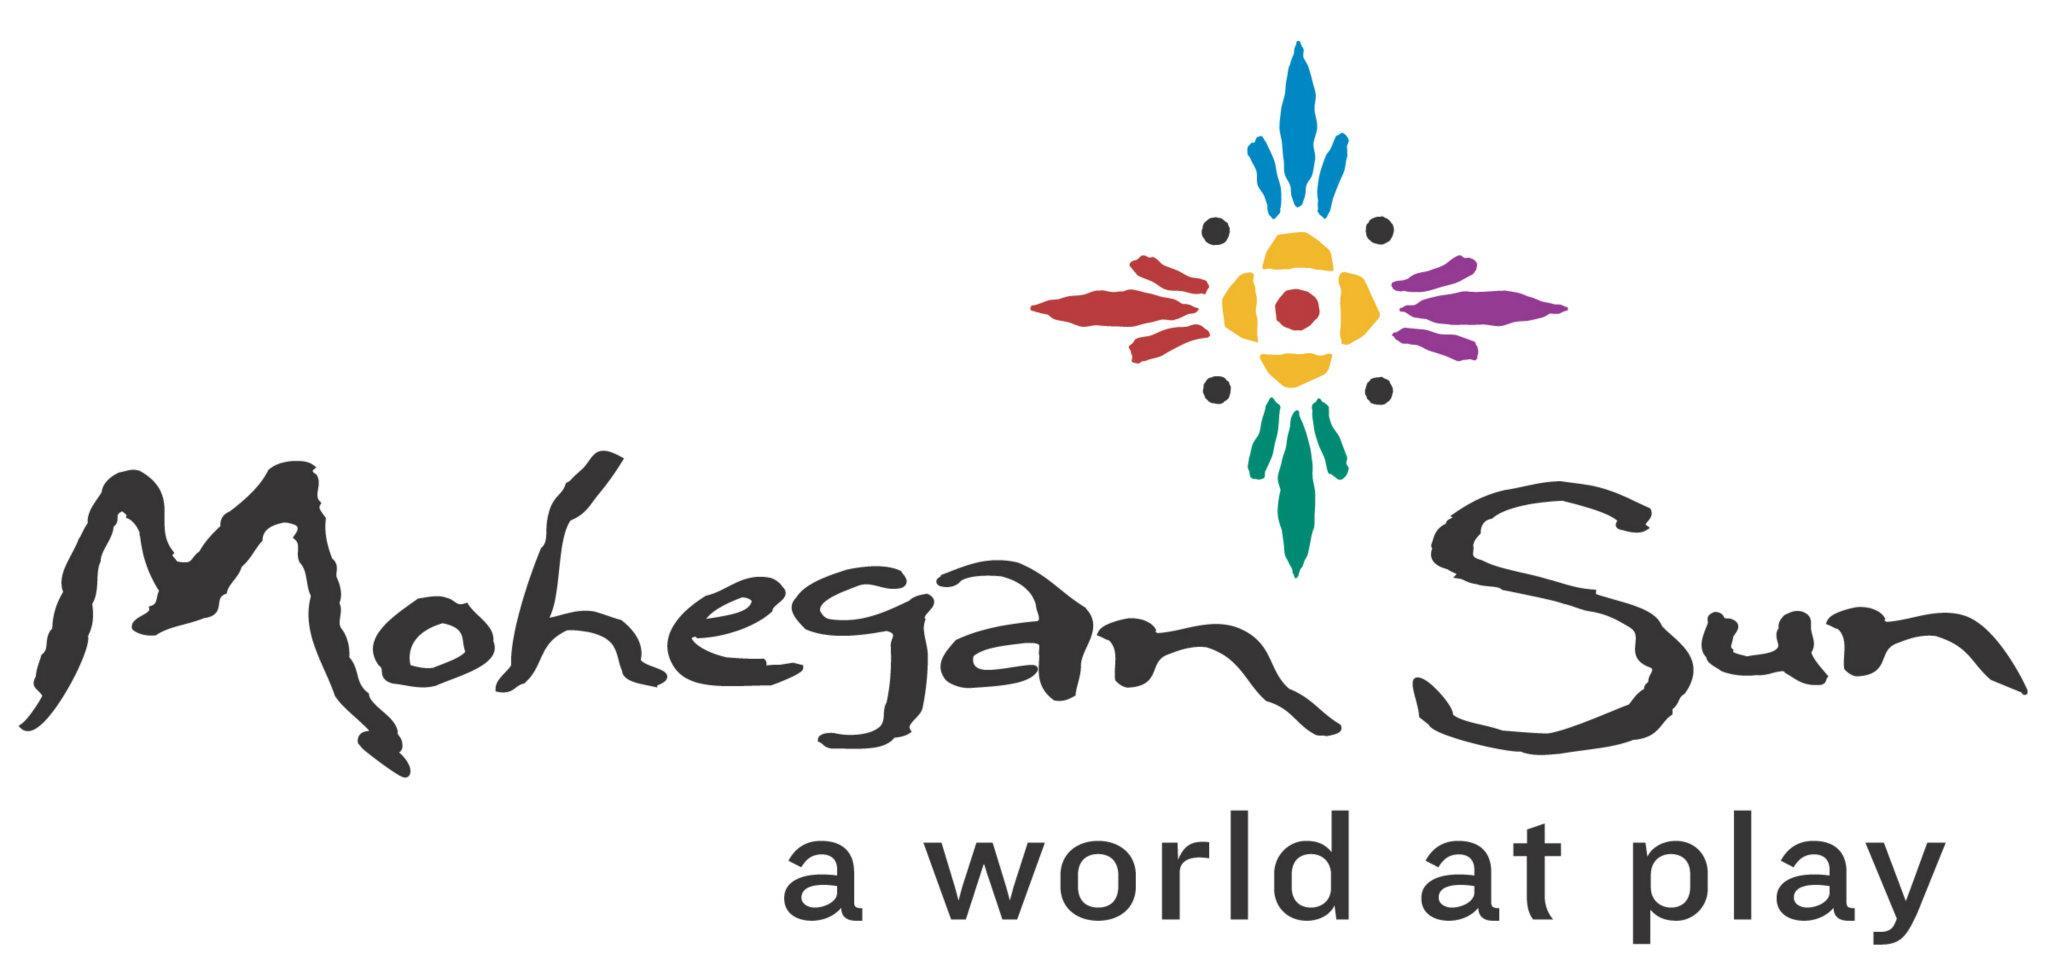 mohegan sun casino usa j1 wiza work and travel summer program 2016 uncasville connecticut iecenter (